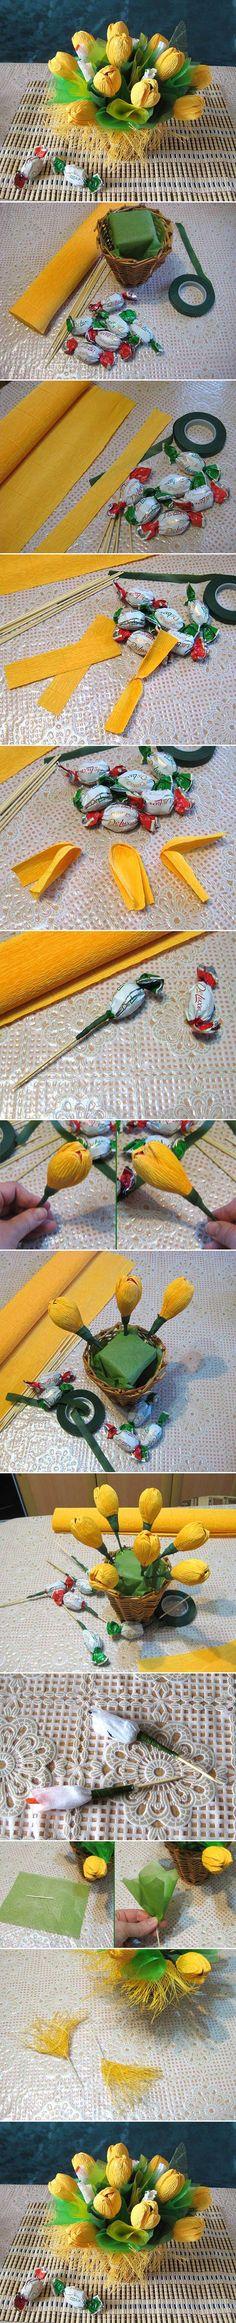 DIY Yellow Flower Candy Bouquet Una canastita floral. ¡Oh sorpresa!, eran caramelos.